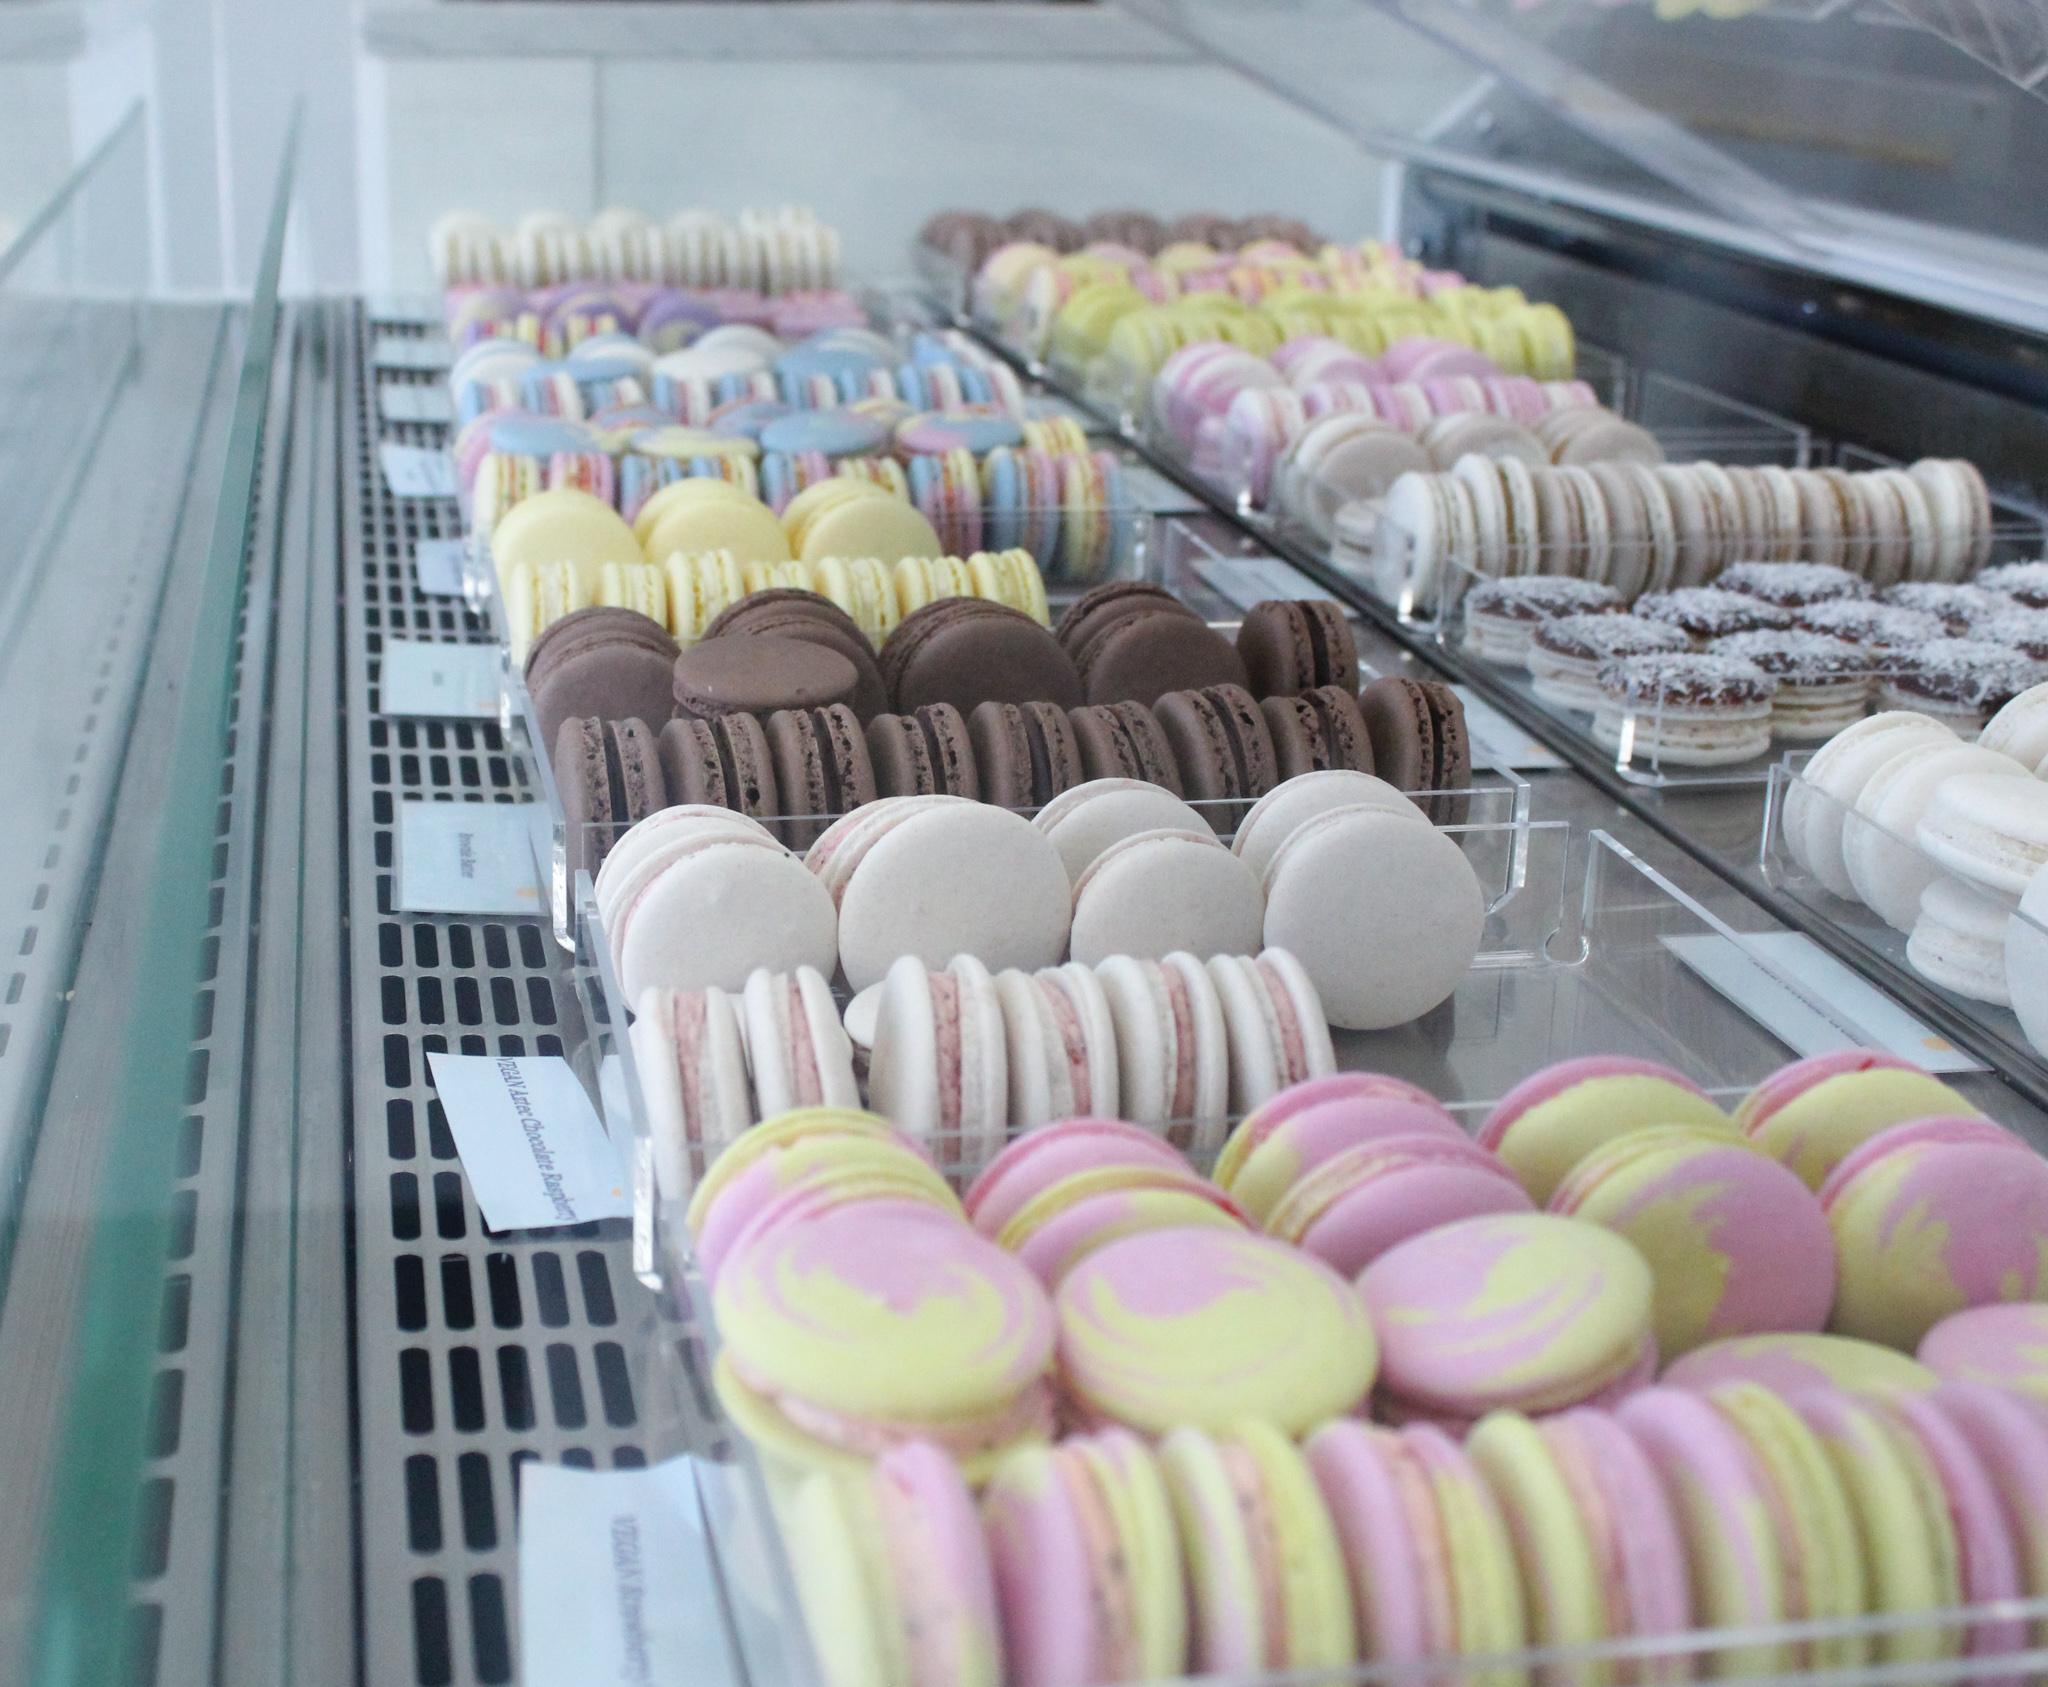 Rotating VEGAN Macaron flavors!